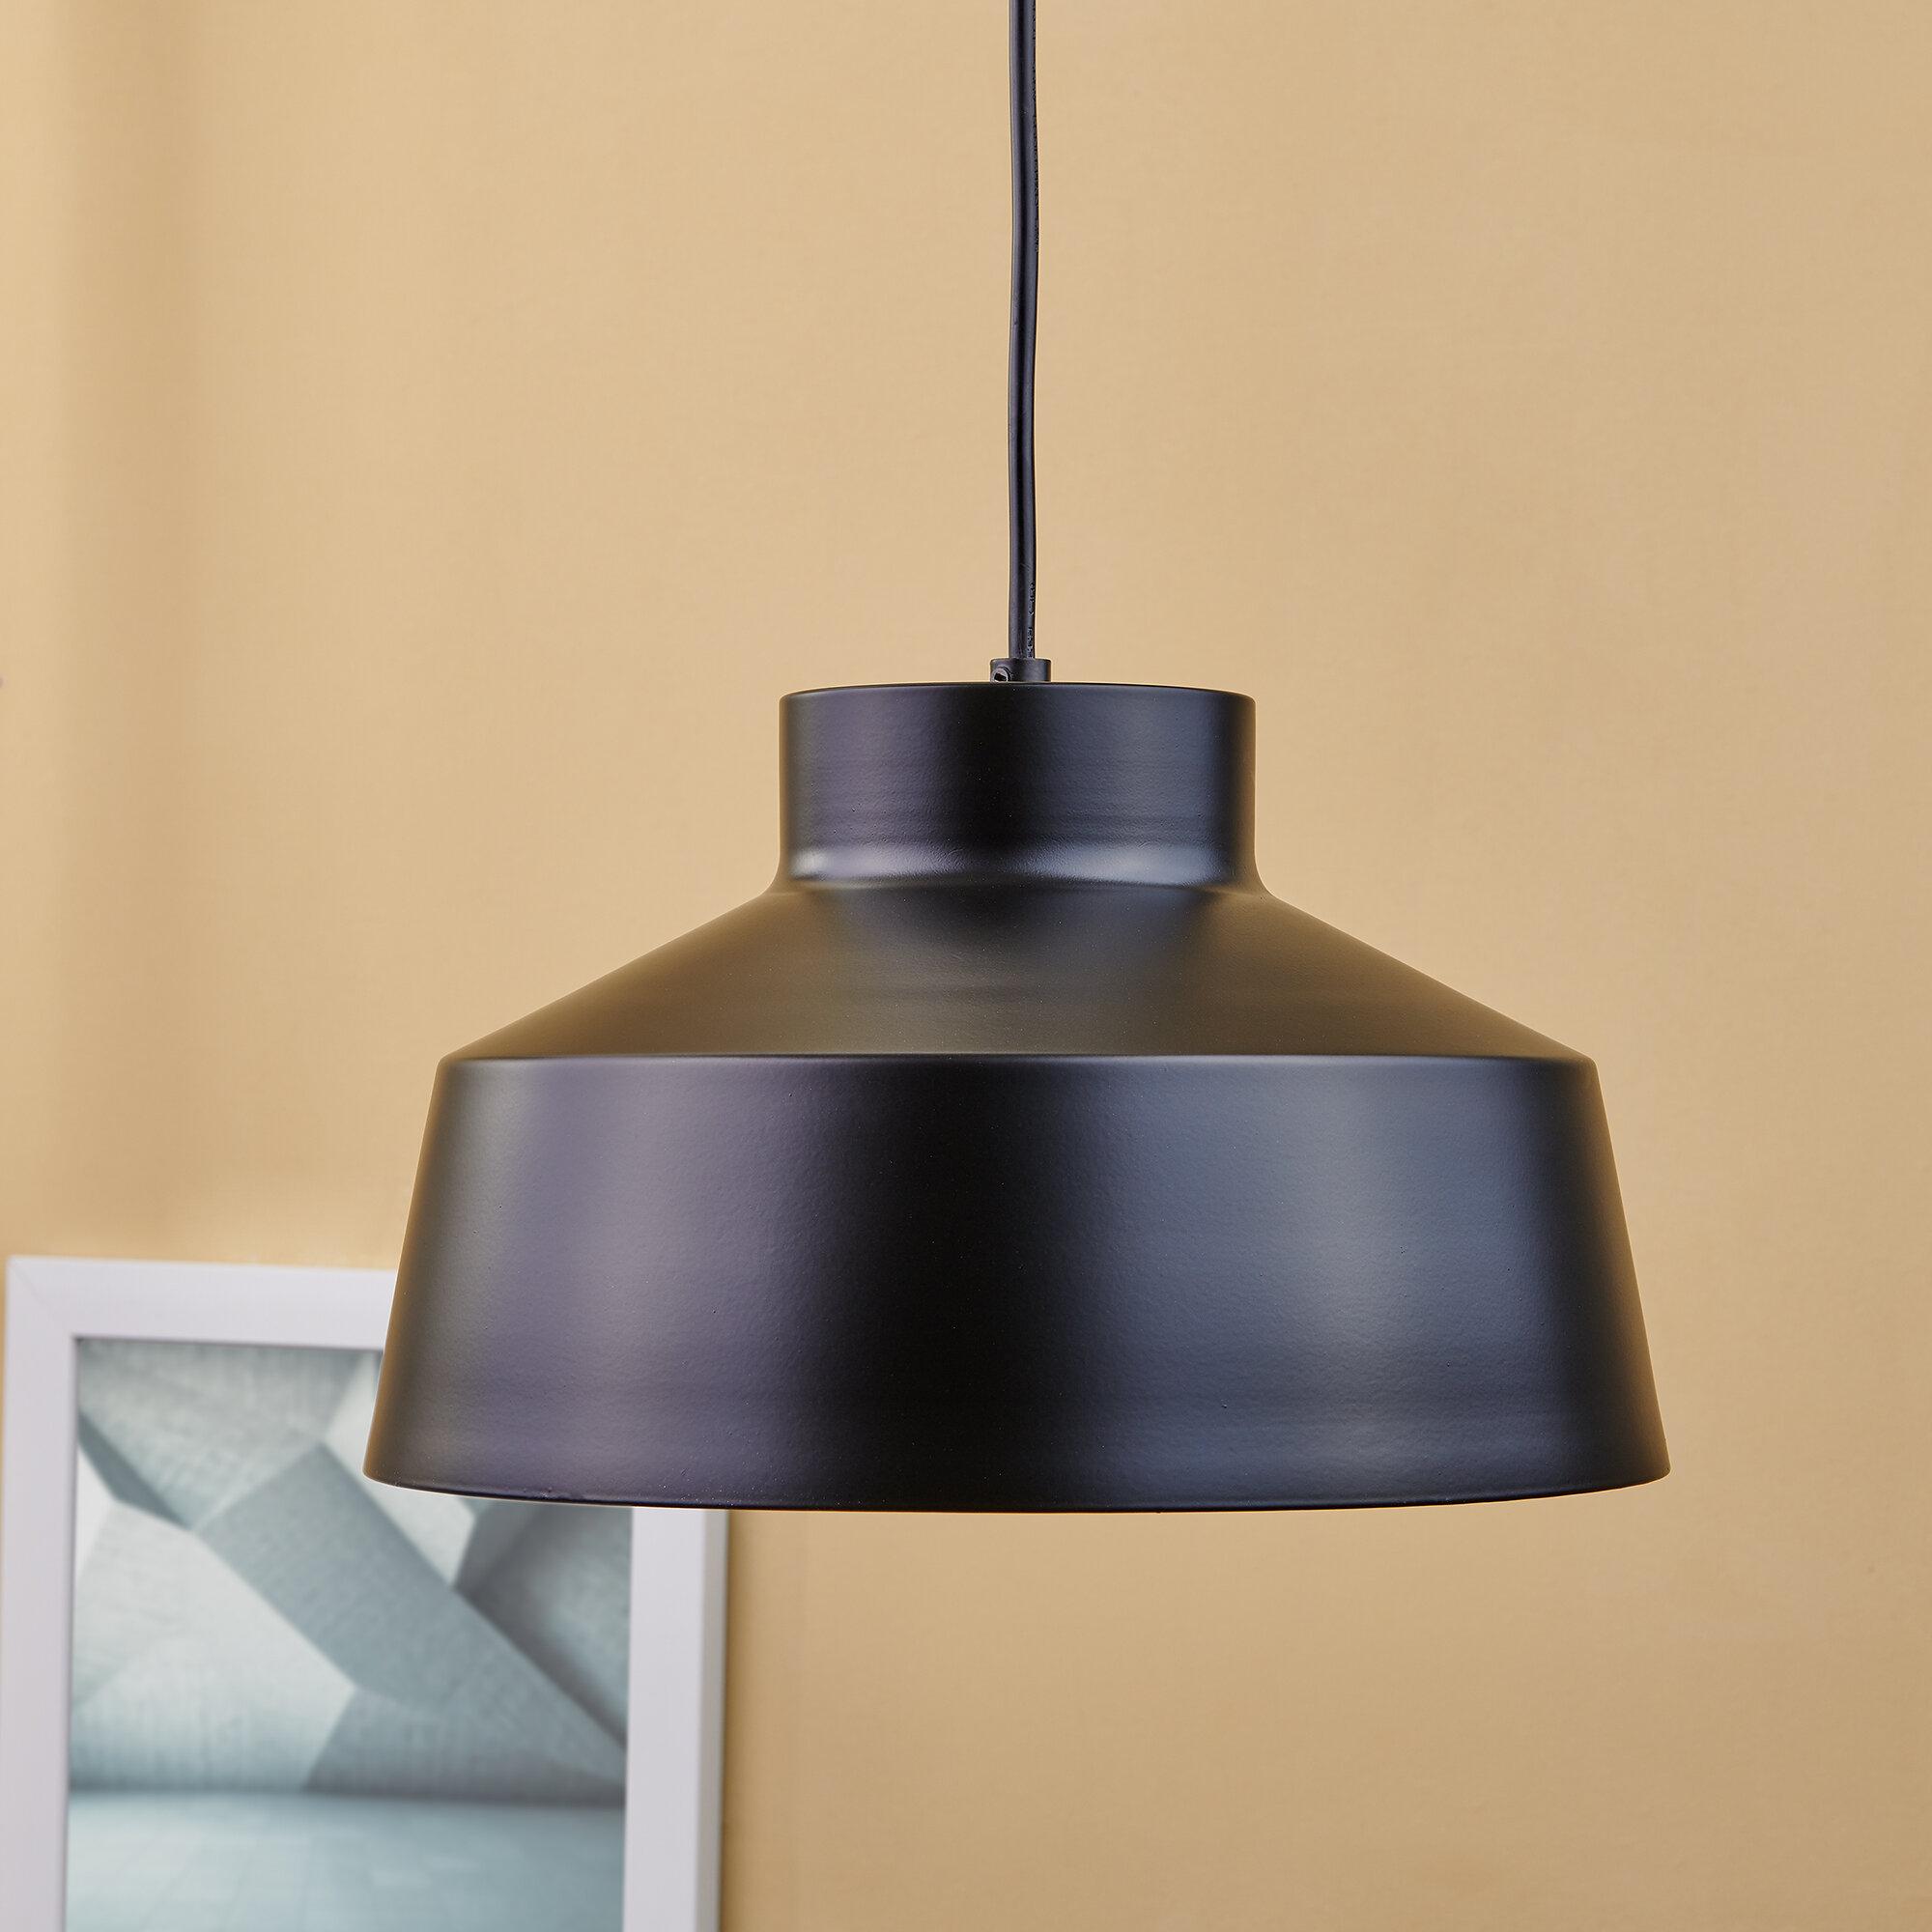 Oversized Dome Pendant Light | Wayfair With Monadnock 1 Light Single Dome Pendants (View 24 of 30)